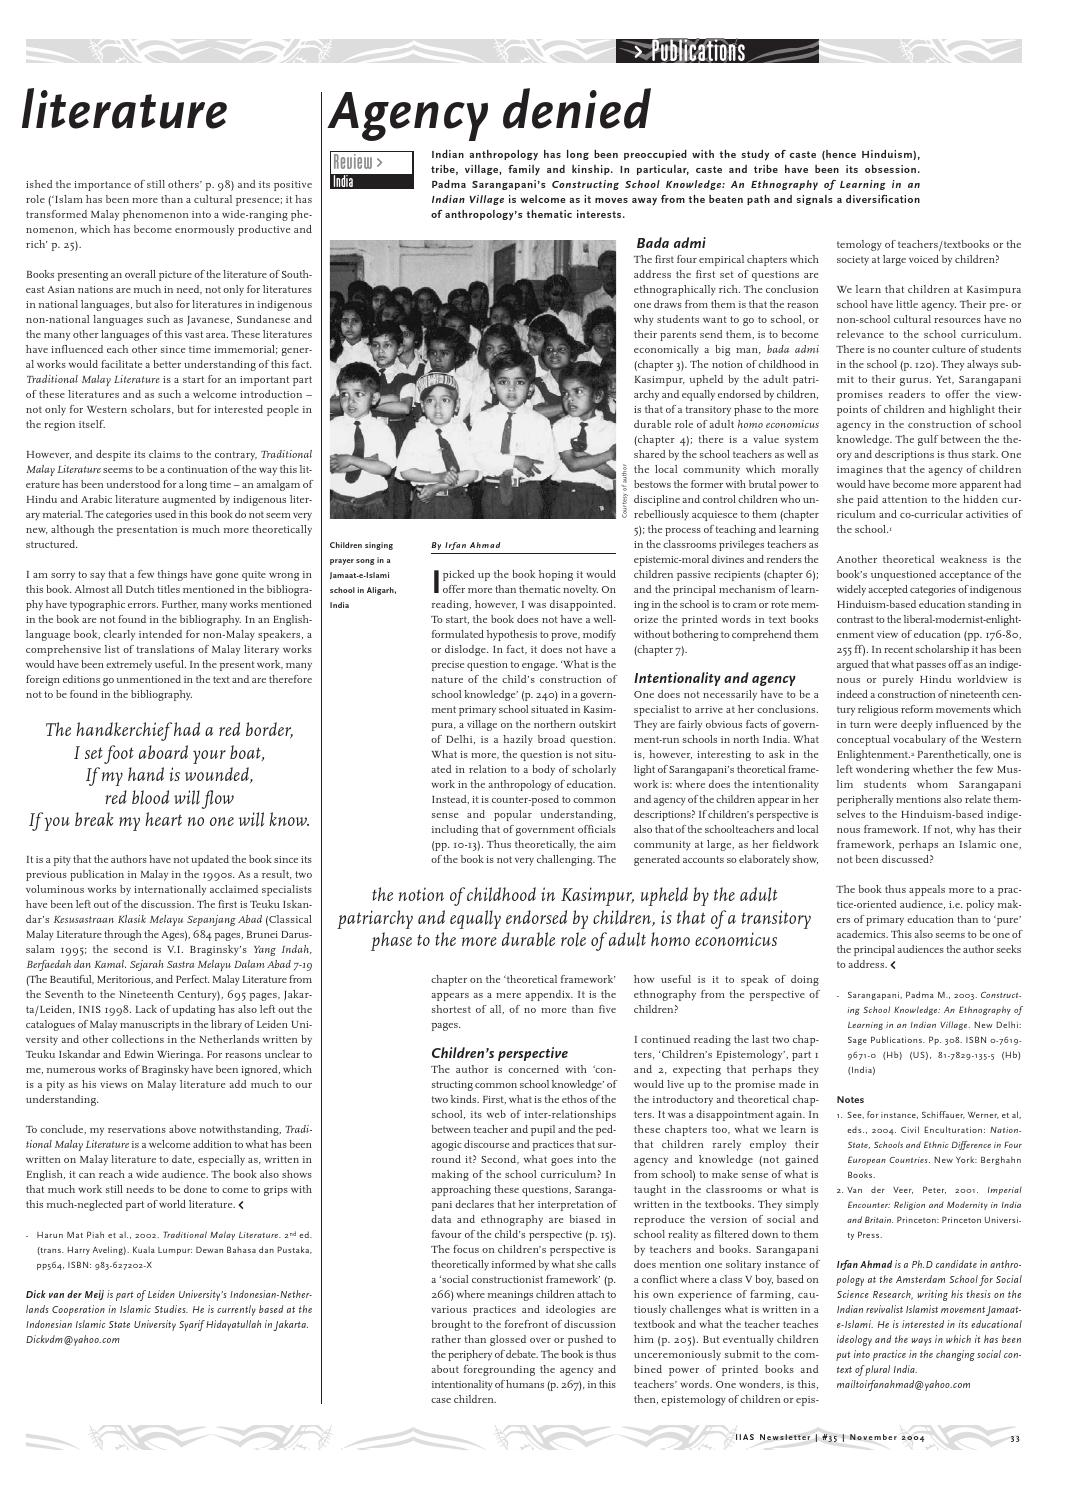 IIAS Newsletter 35 by International Institute for Asian Studies - issuu